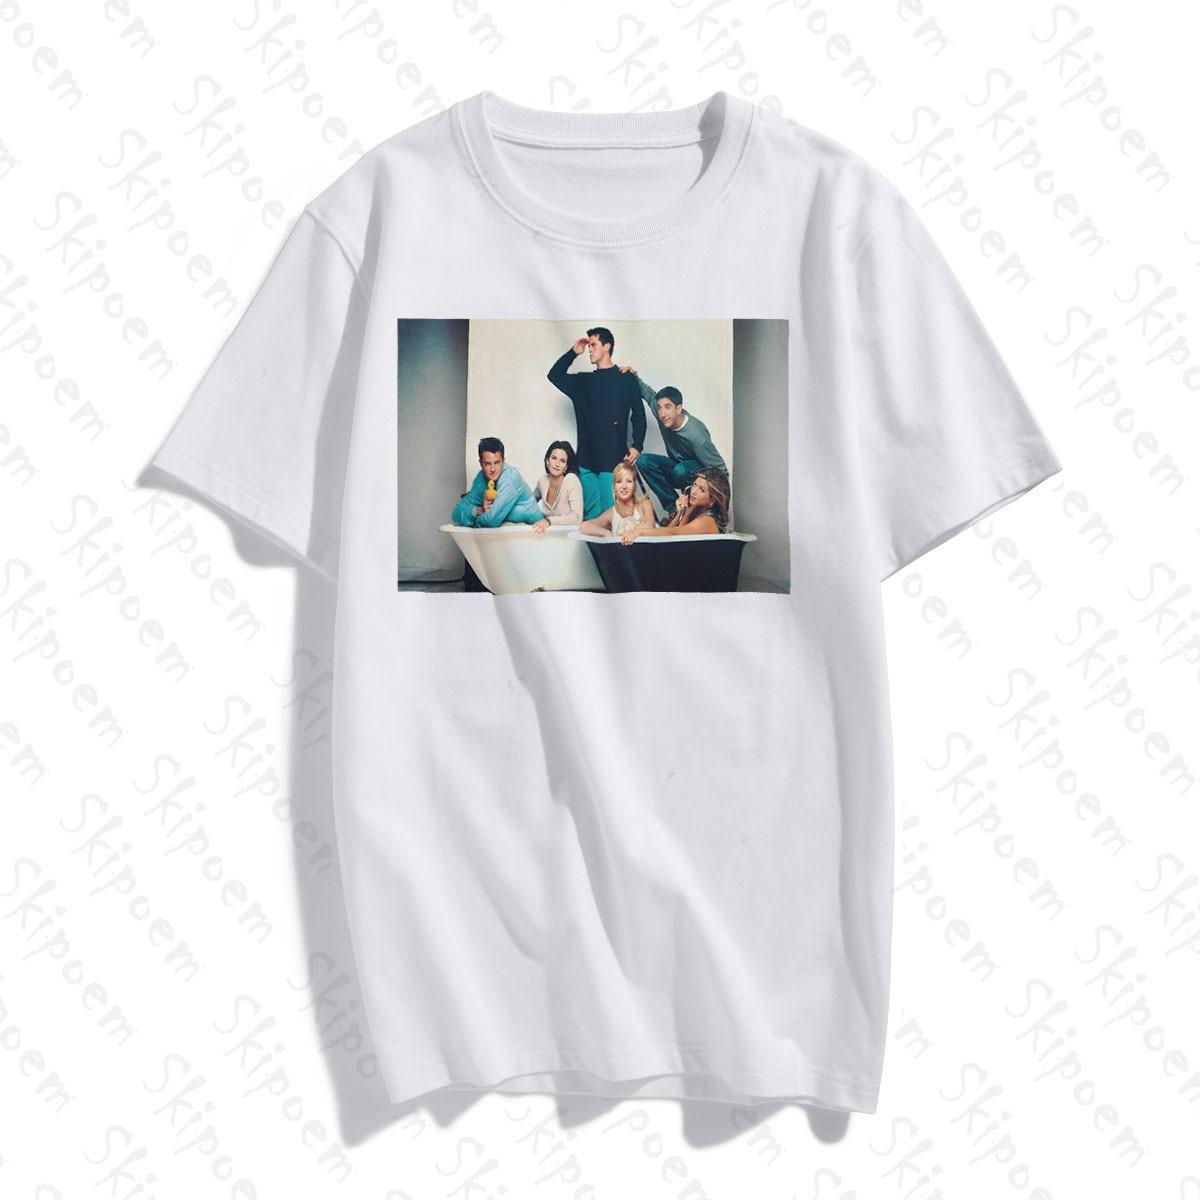 New Cotton Women T Shirt Friends TV Fashion Art Simple Artwork Print Short Sleeve Tops & Tees Fashion Casual  Brand Clothing